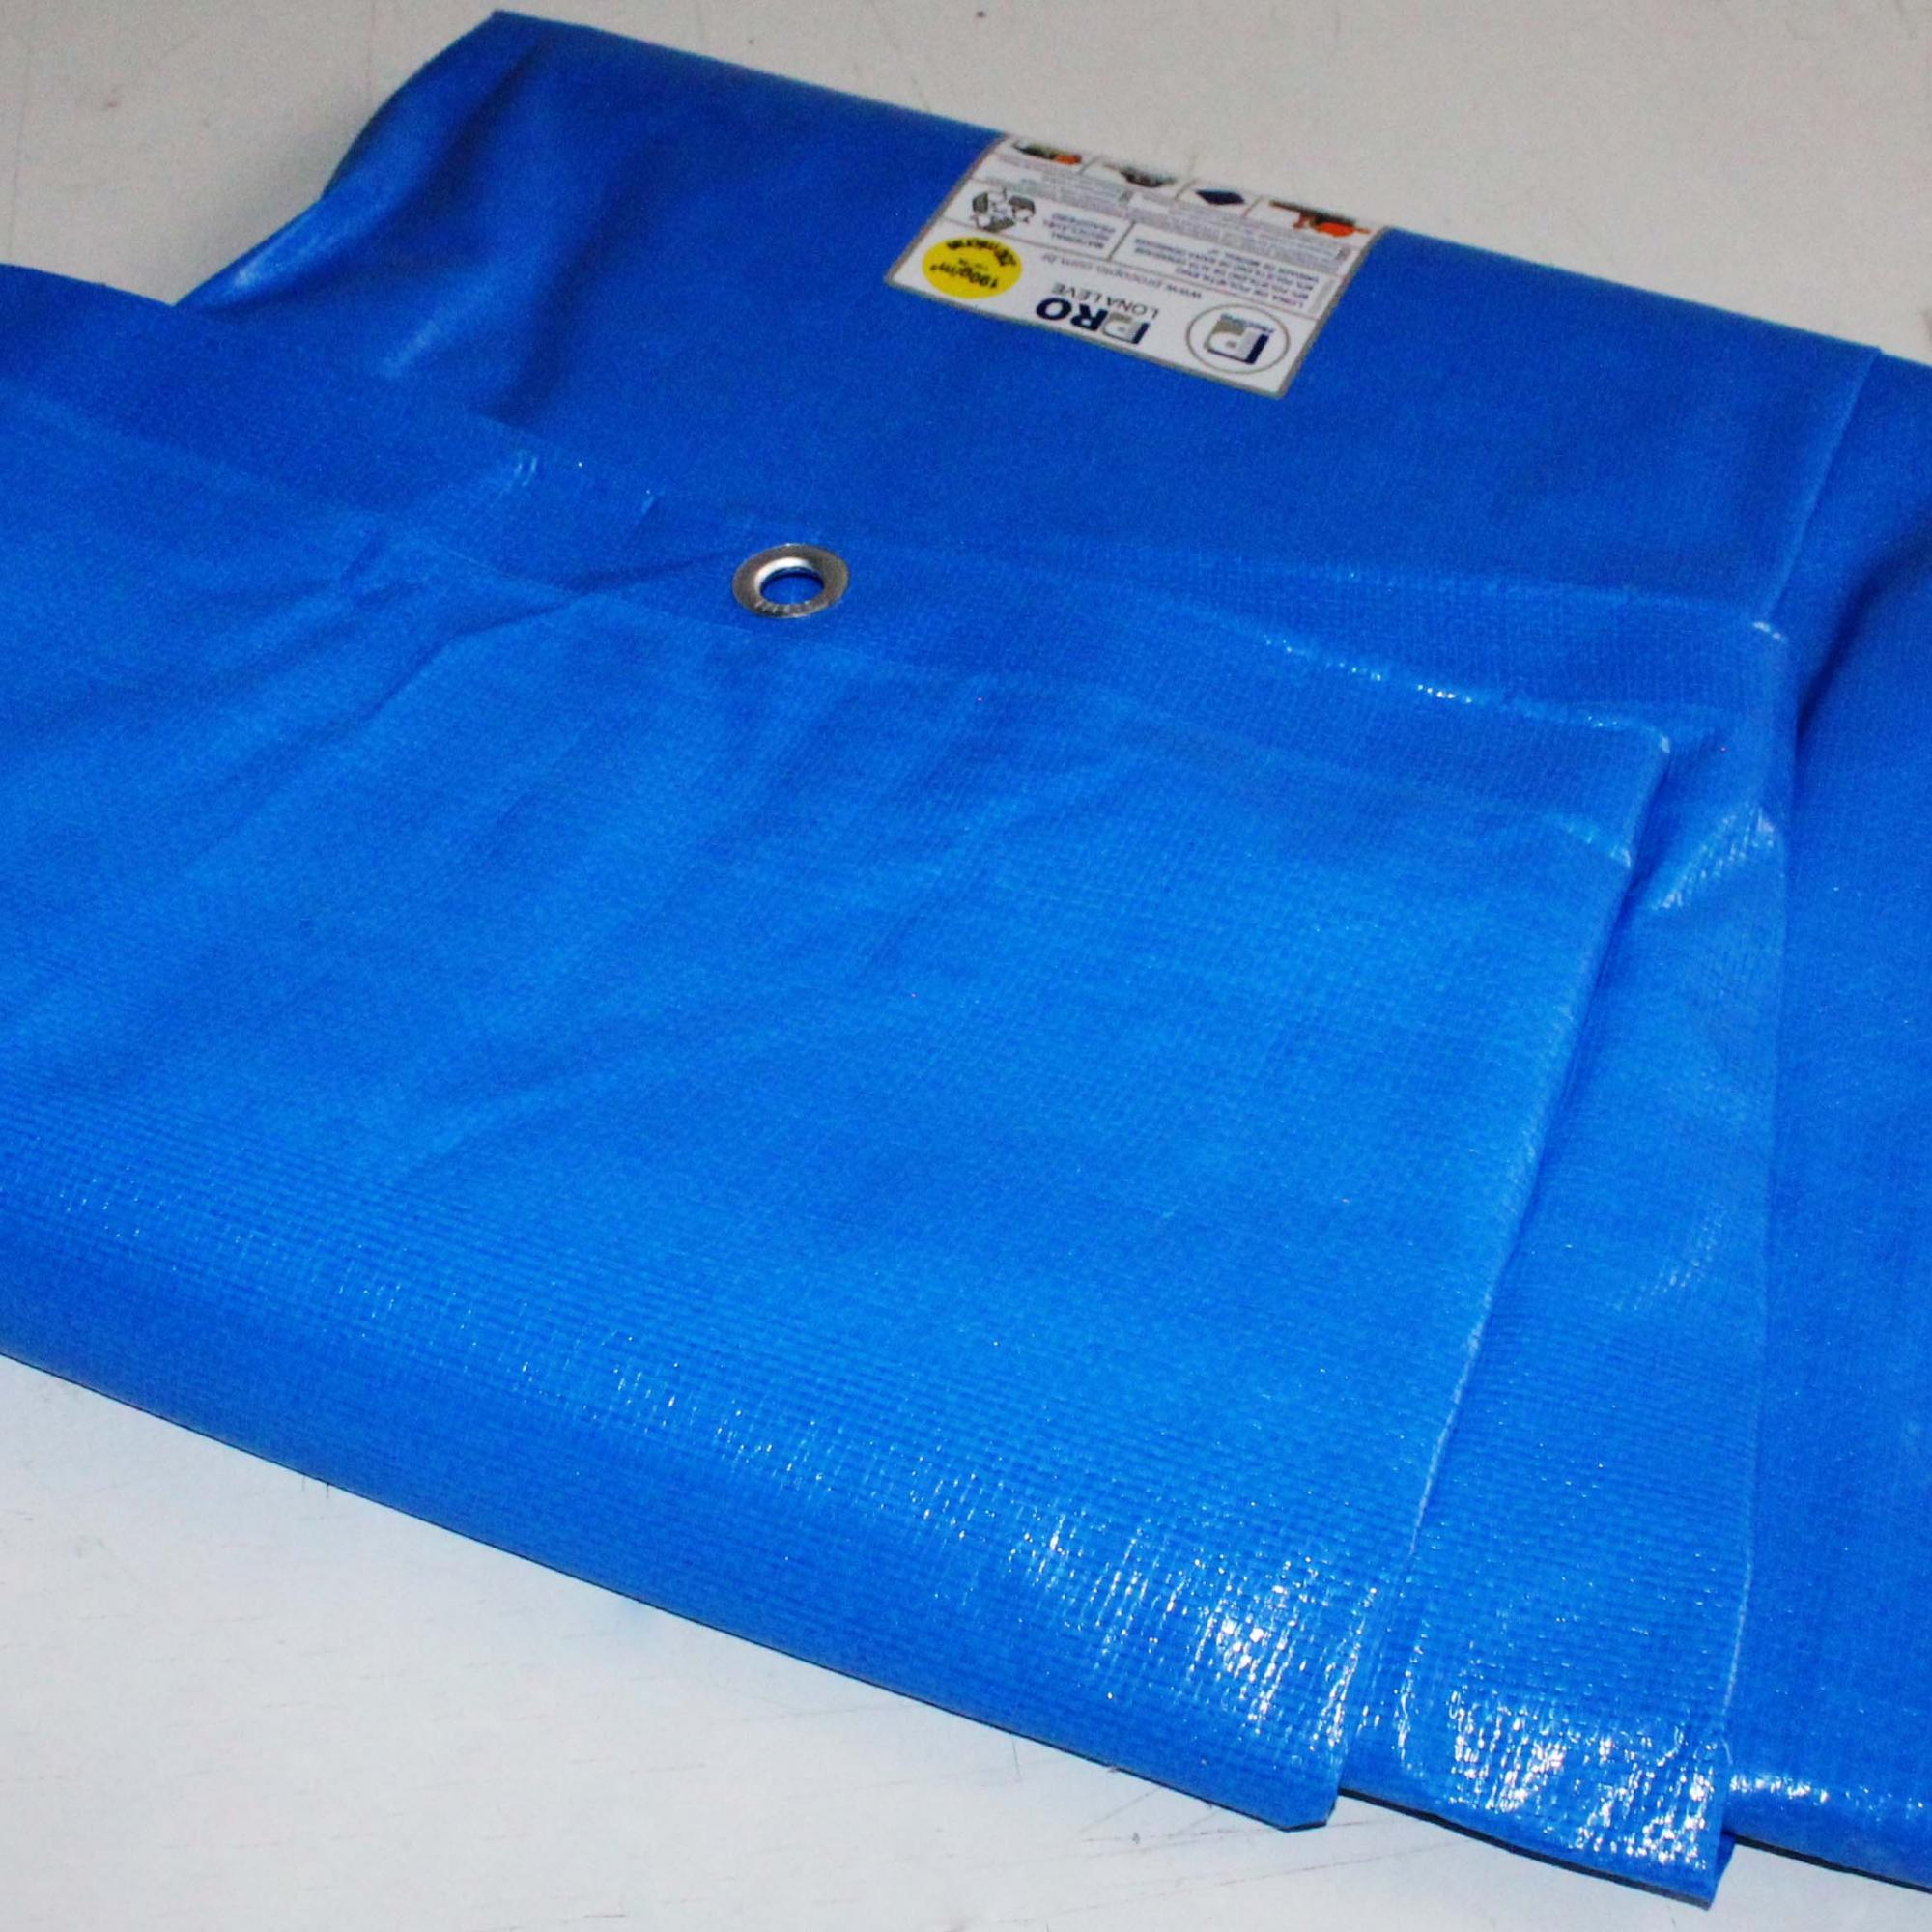 Prolona leve agric azul 2x2m